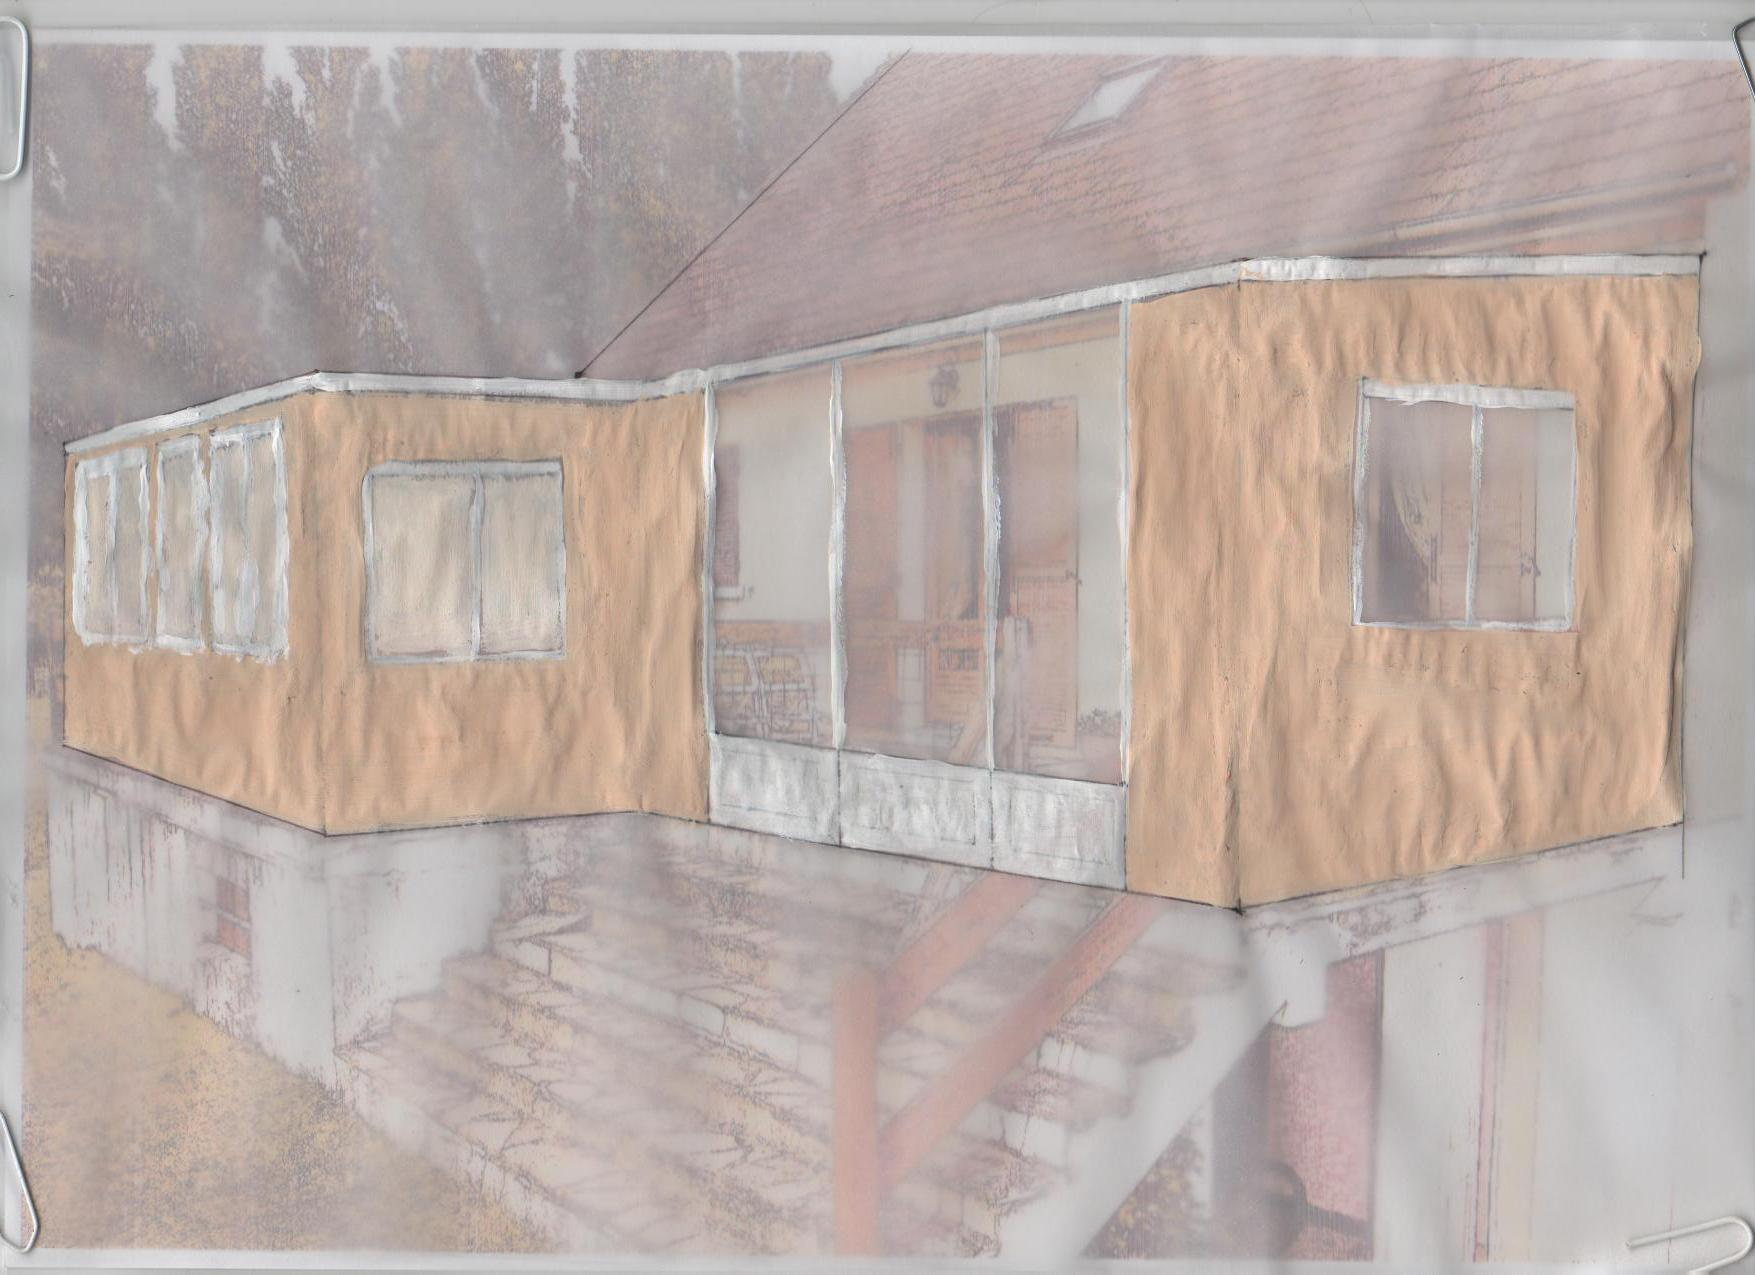 Permis de construire pour une veranda for Obtenir permis de construire